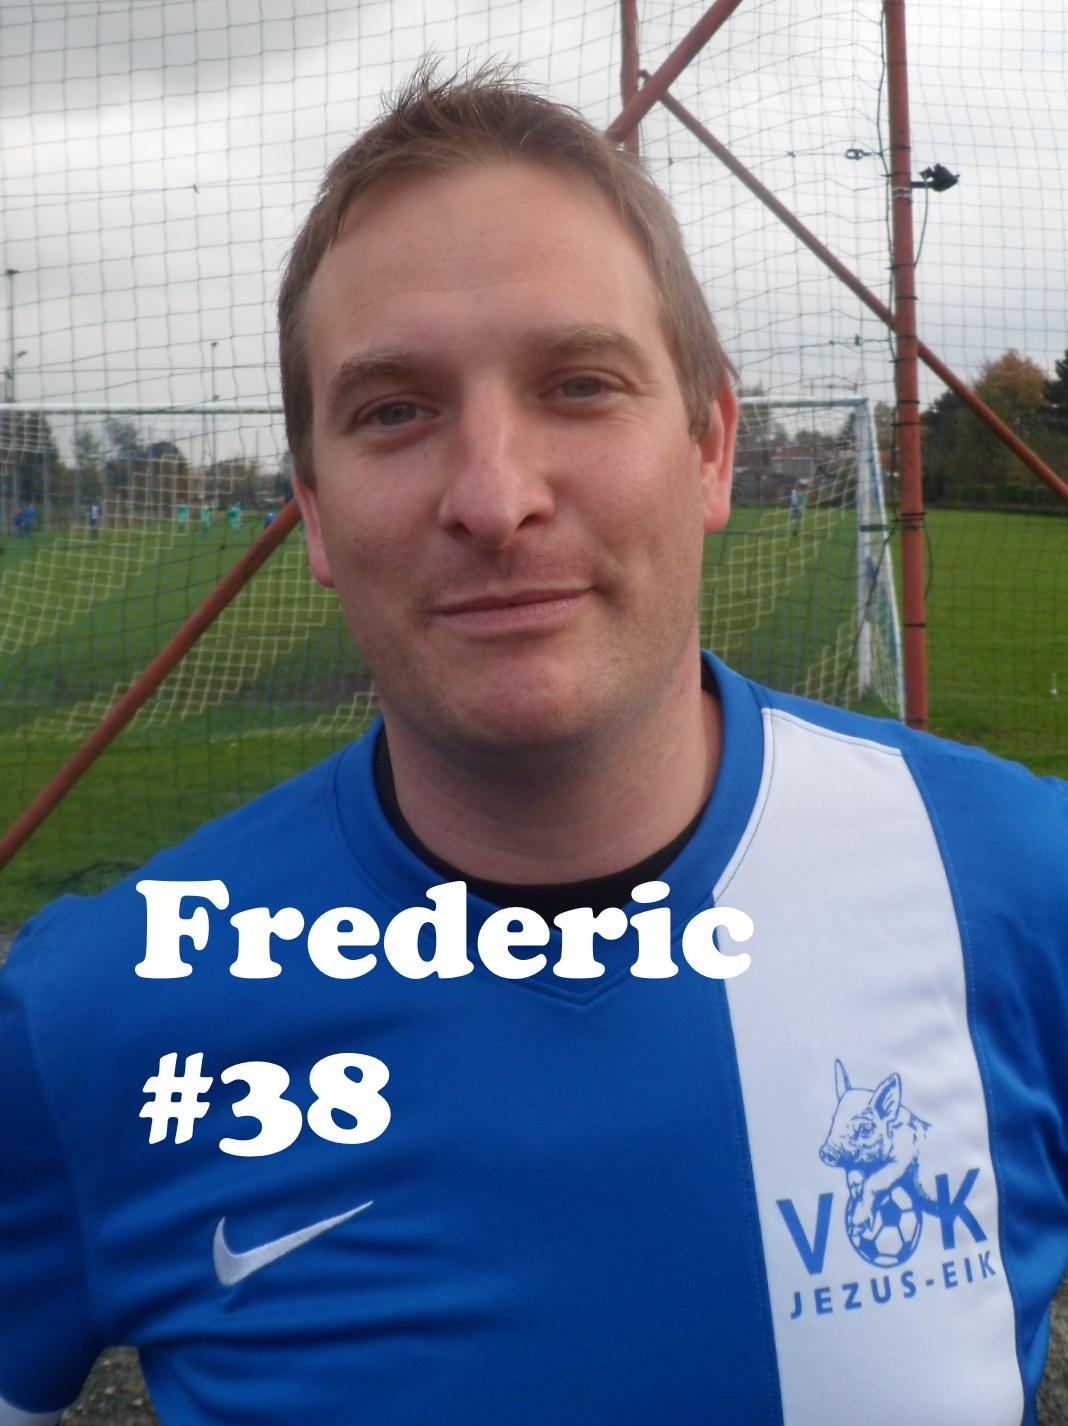 Frederic.jpg